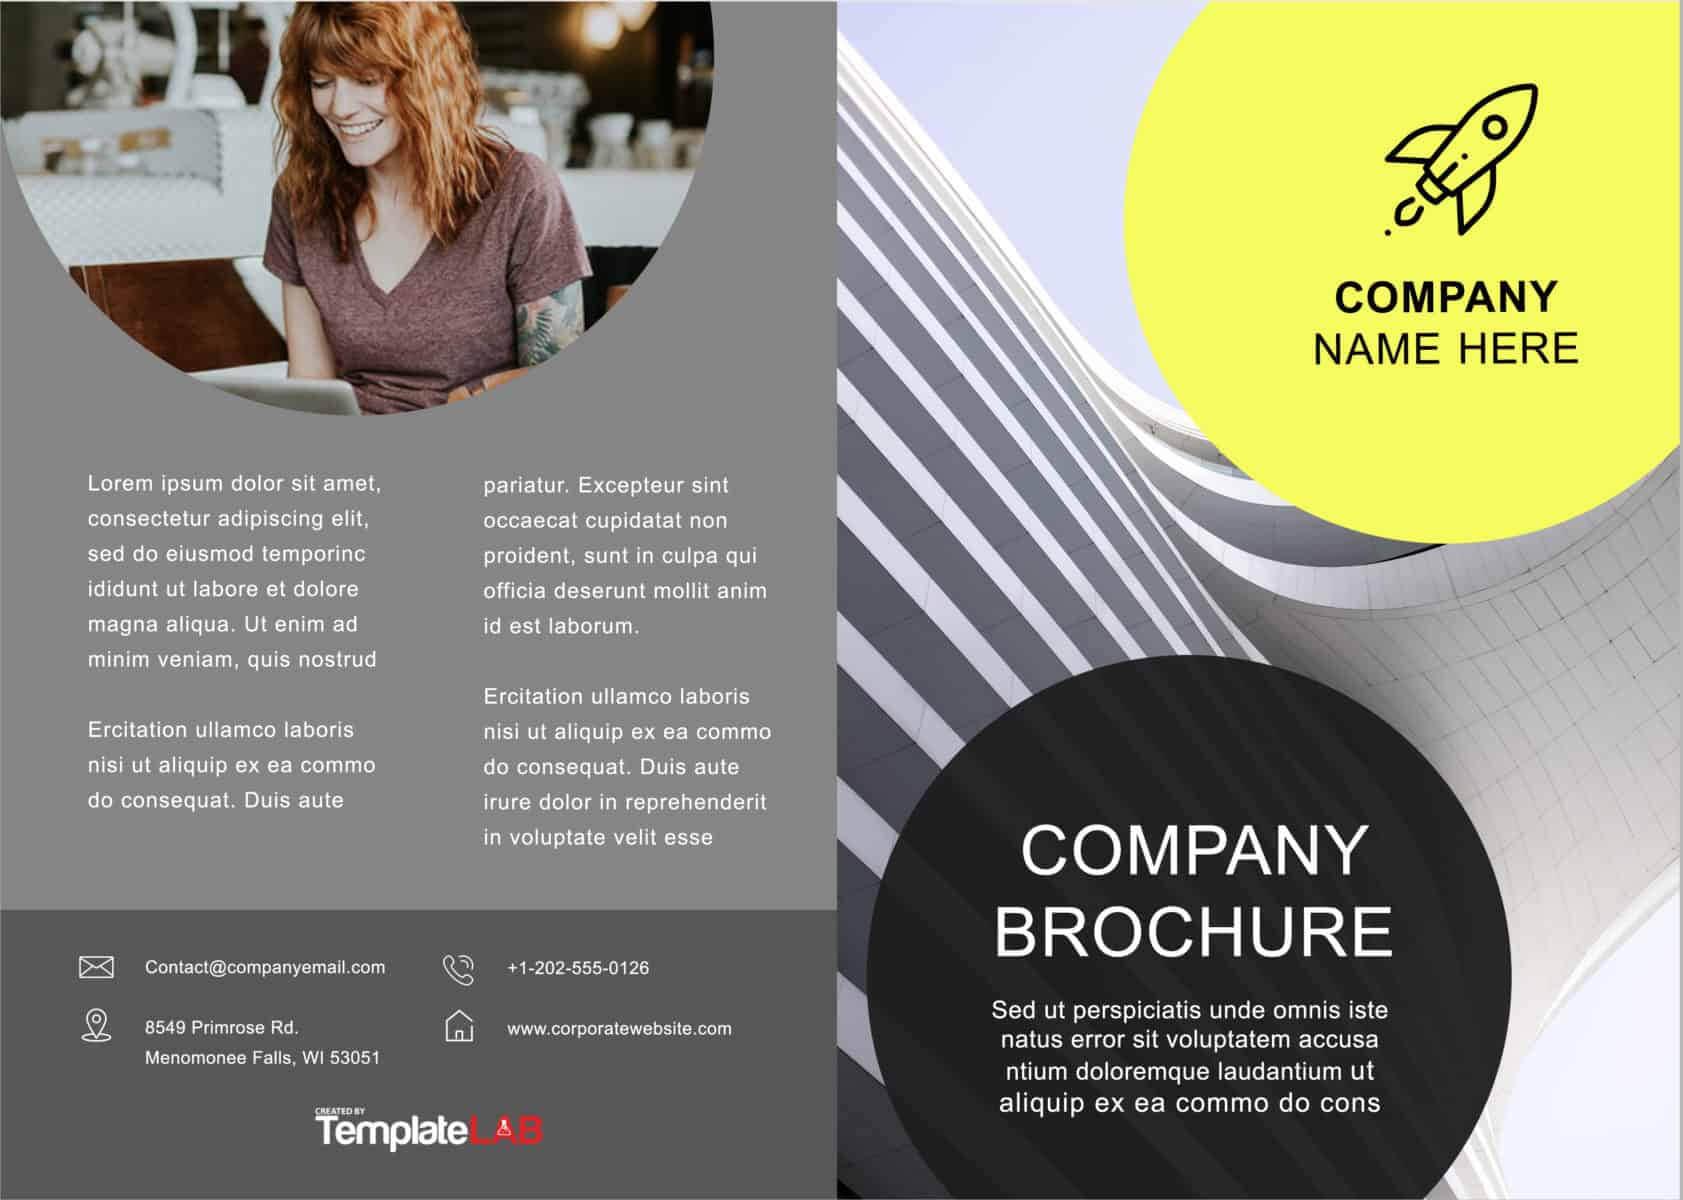 33 Free Brochure Templates (Word + Pdf) ᐅ Templatelab Within Free Brochure Templates For Word 2010